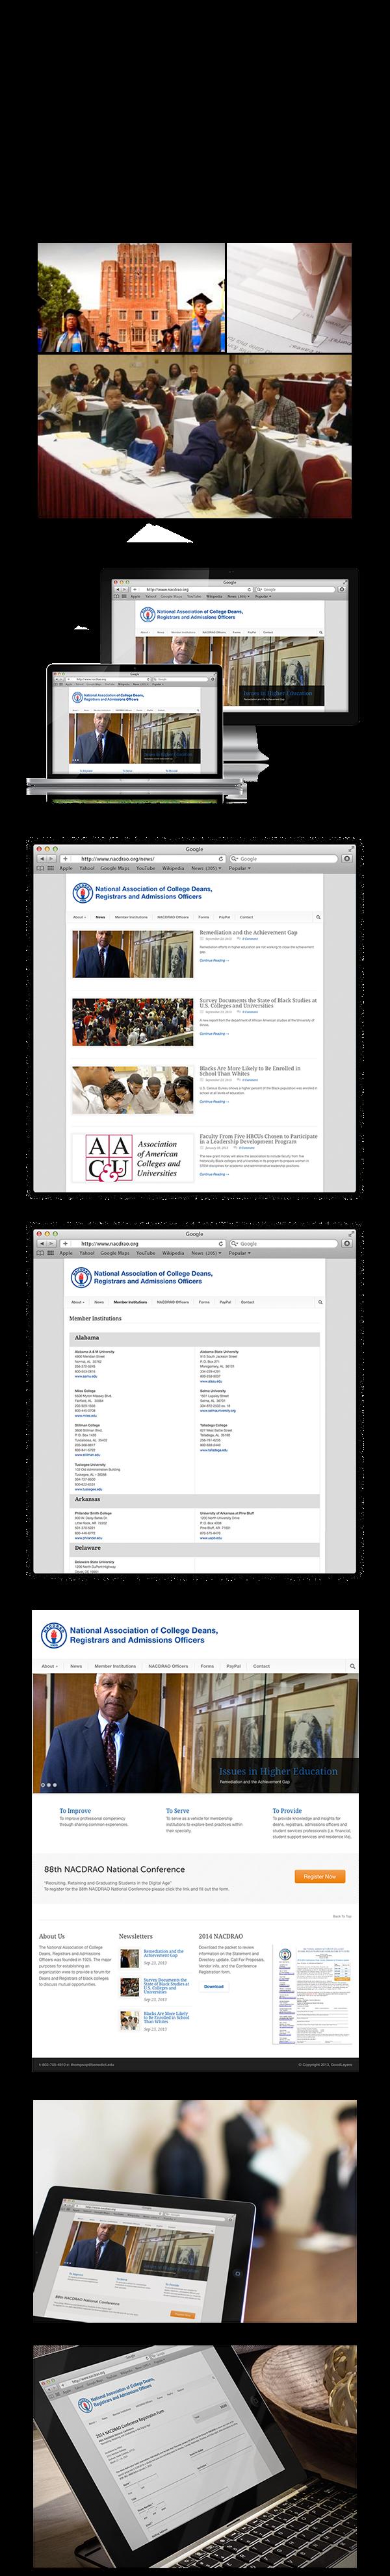 NACDRAO college dean registrars administrative officers wordpress